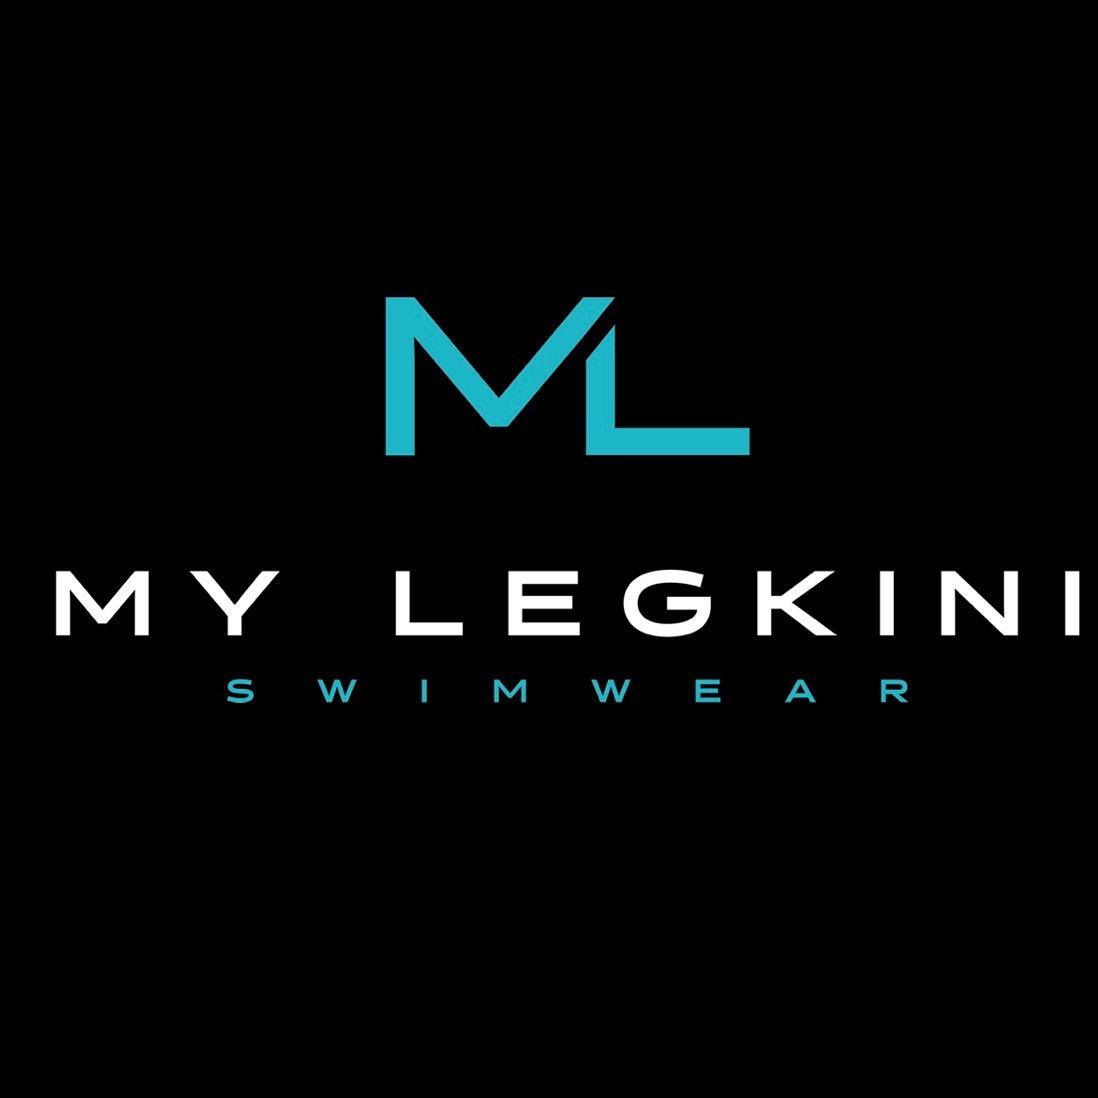 MyLegkini Facebook Page